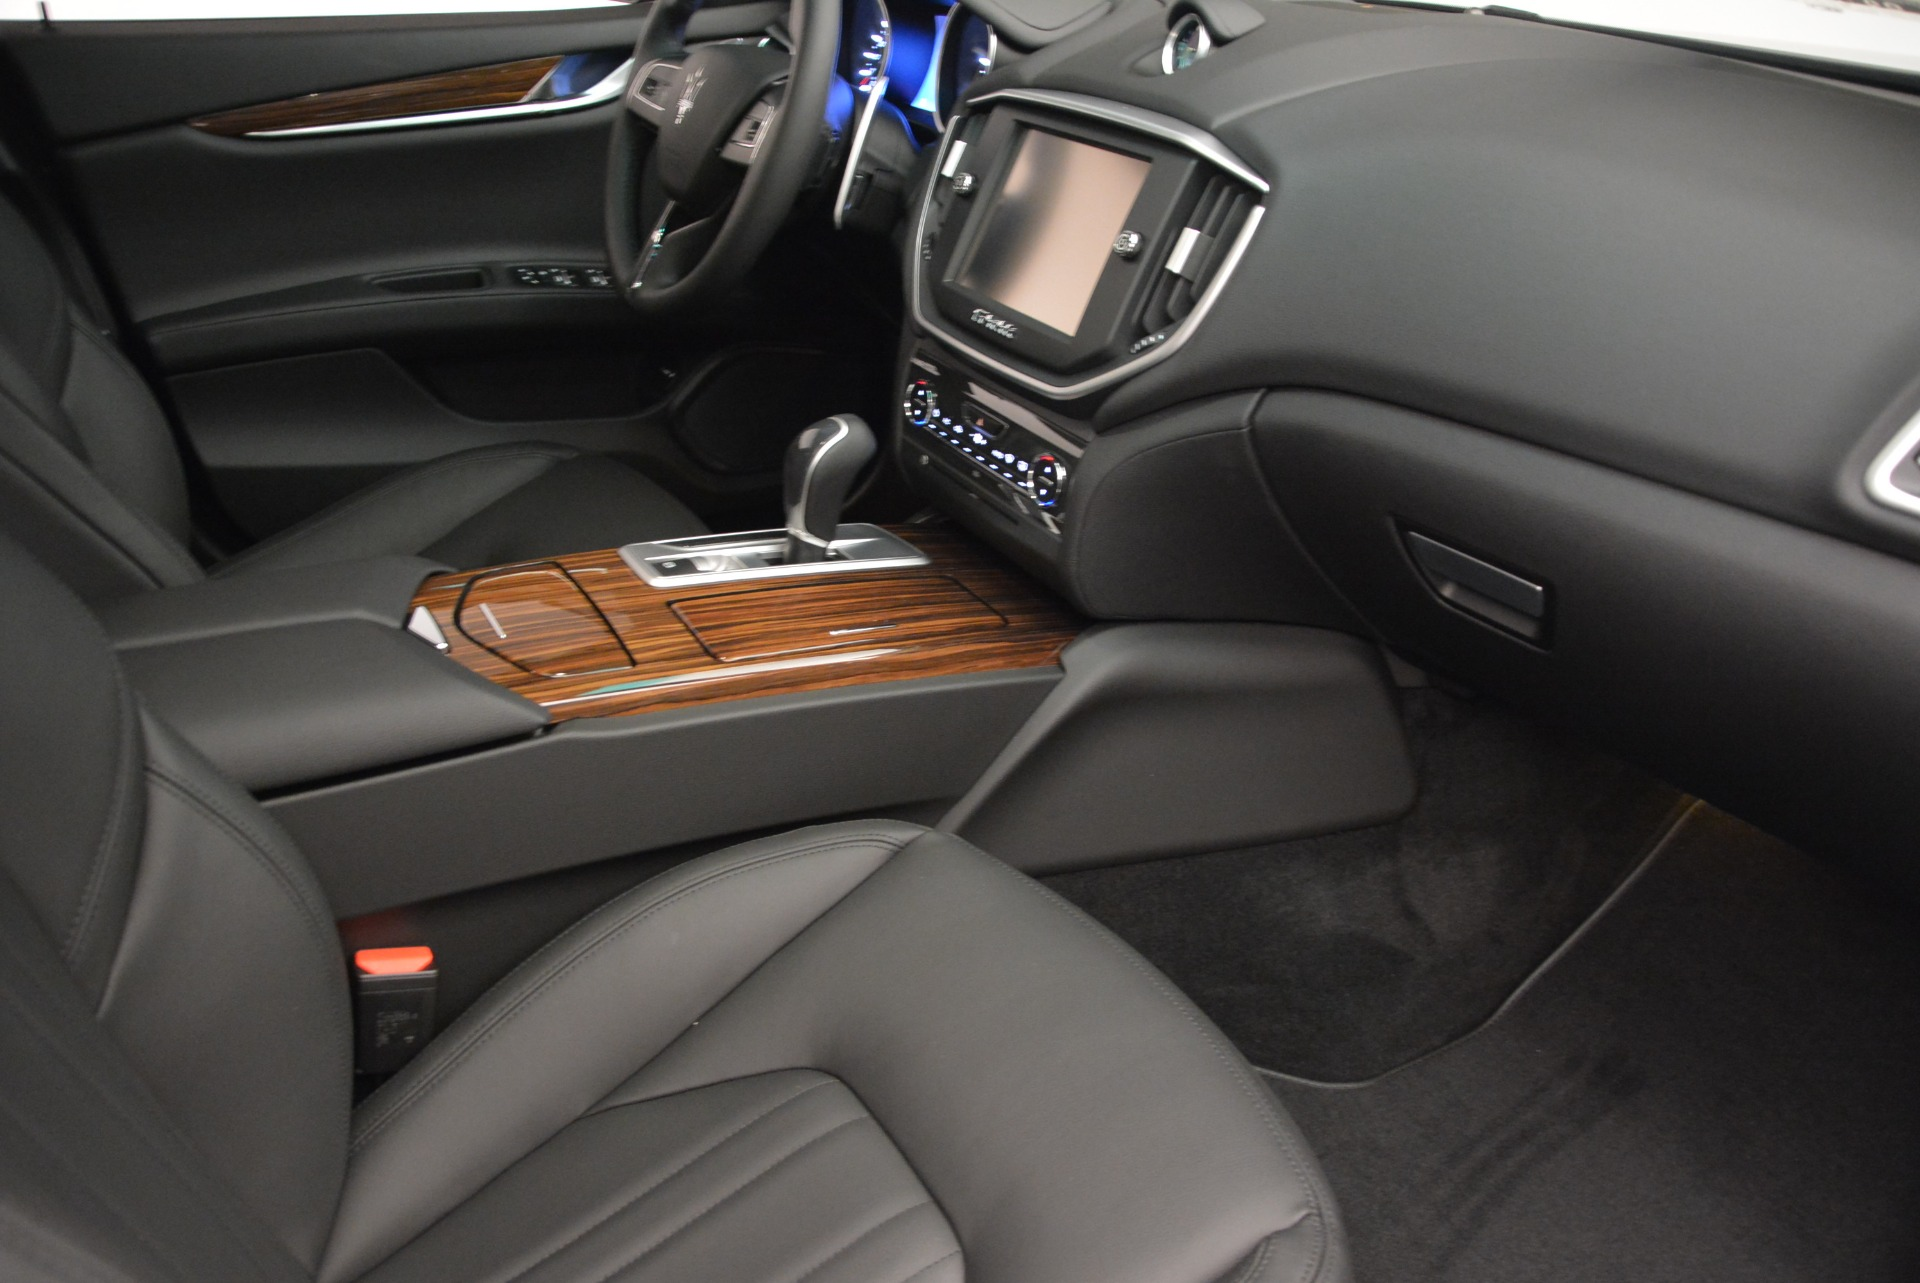 Used 2014 Maserati Ghibli S Q4 For Sale In Greenwich, CT 2562_p20